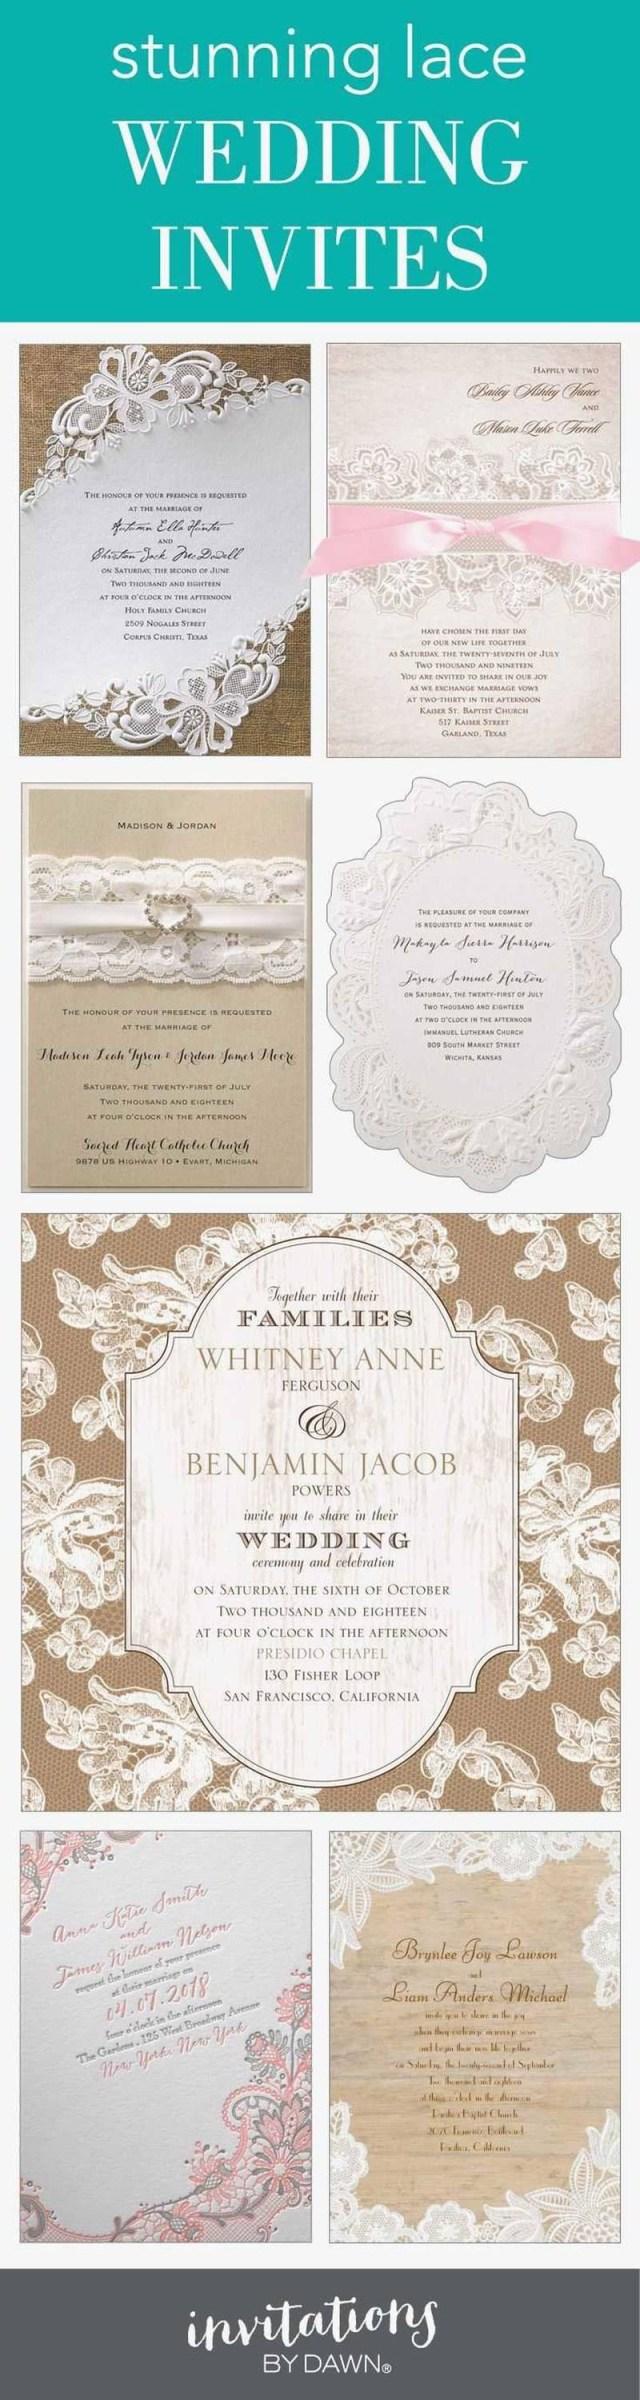 Military Wedding Invitations 206458 Military Wedding Invitations New Wedding Invitation Burlap